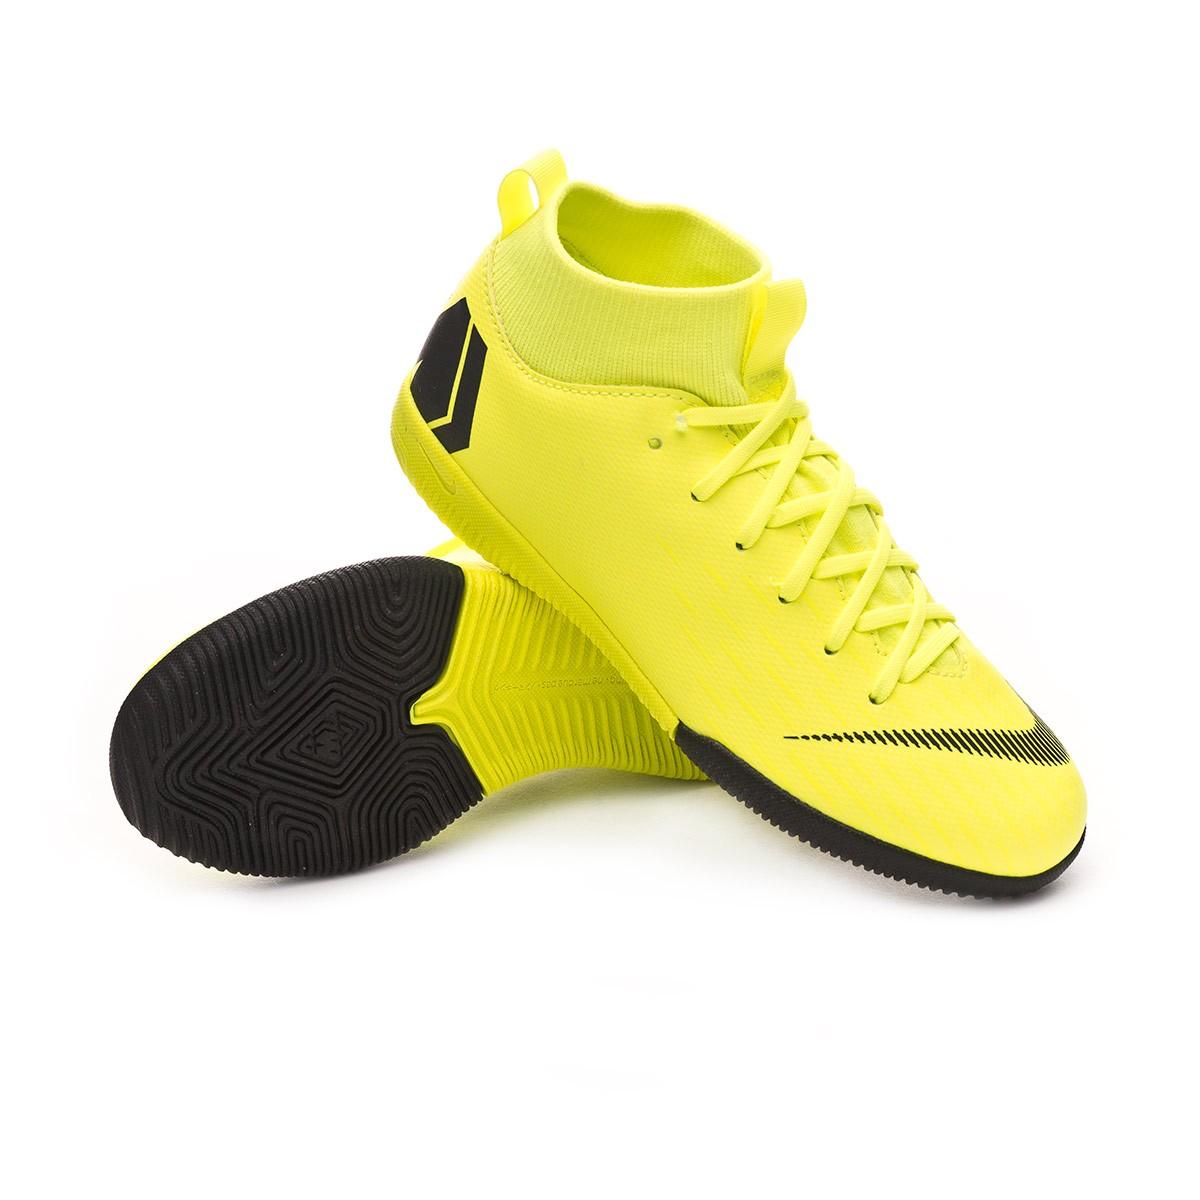 4b7efe8e4166 Futsal Boot Nike Kids Mercurial SuperflyX VI Academy IC Volt-Black -  Football store Fútbol Emotion